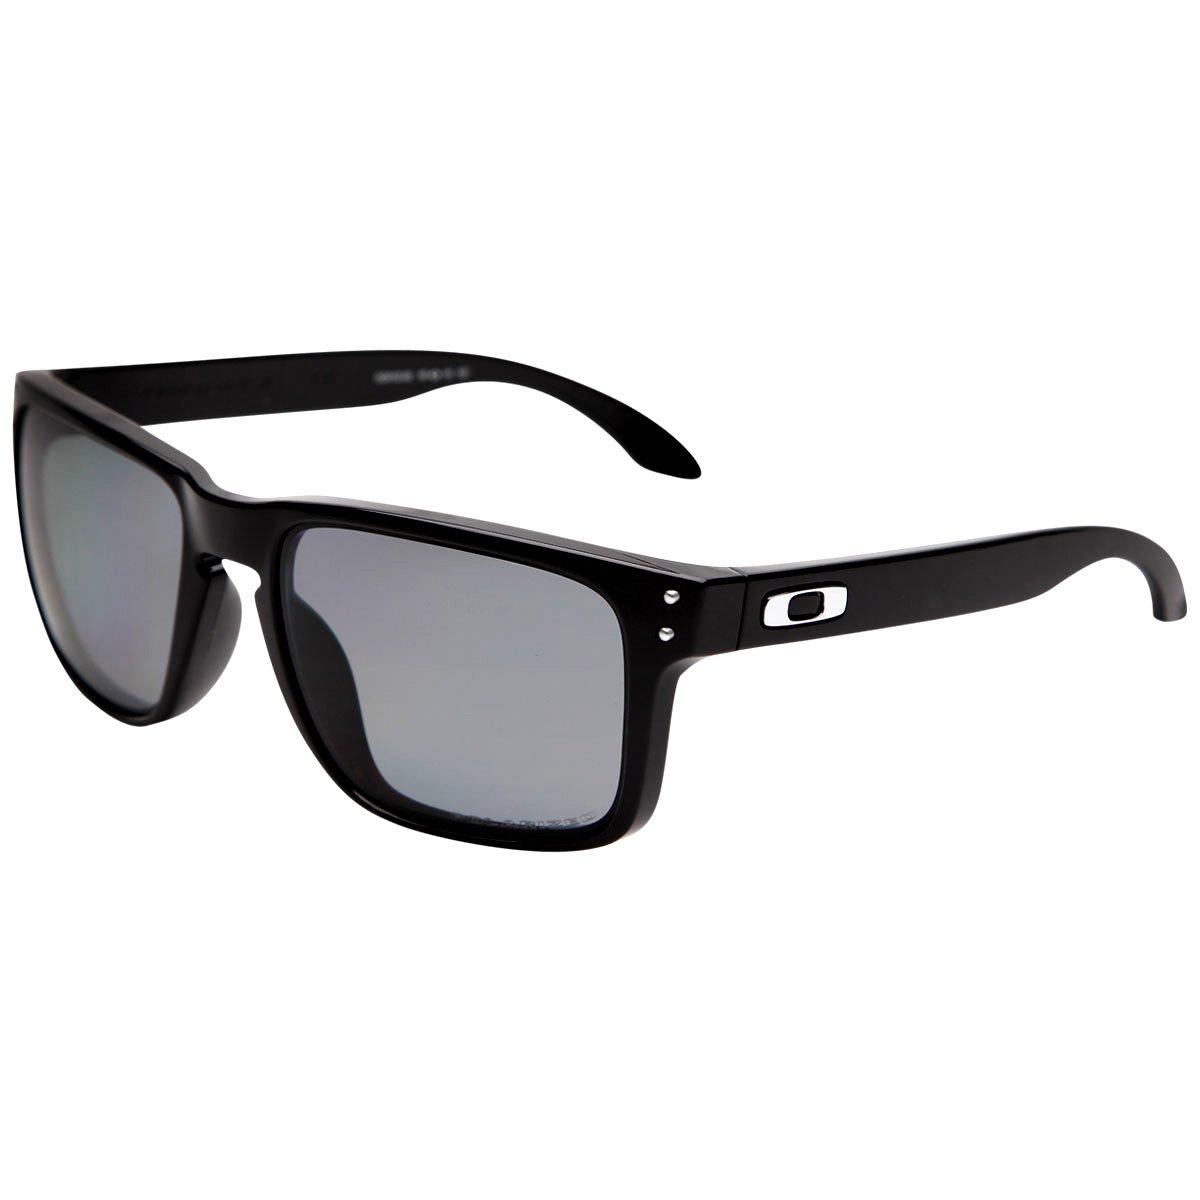 ab1202dc8d64b Óculos de Sol Oakley Holbrook Masculino - Preto - Compre Agora   Zattini